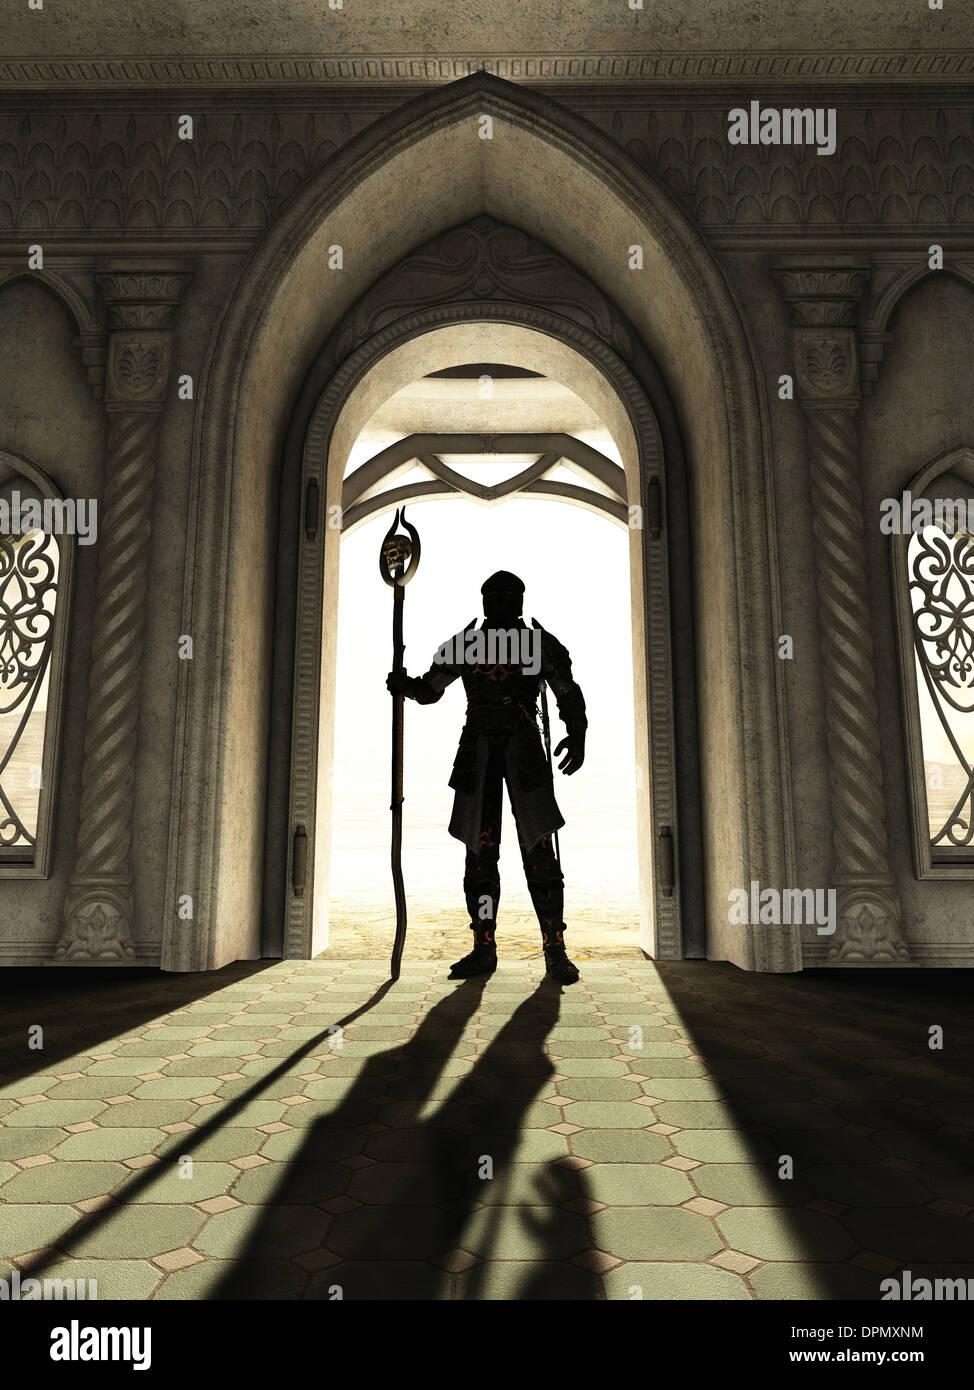 Dark Lord at the Threshold - Stock Image